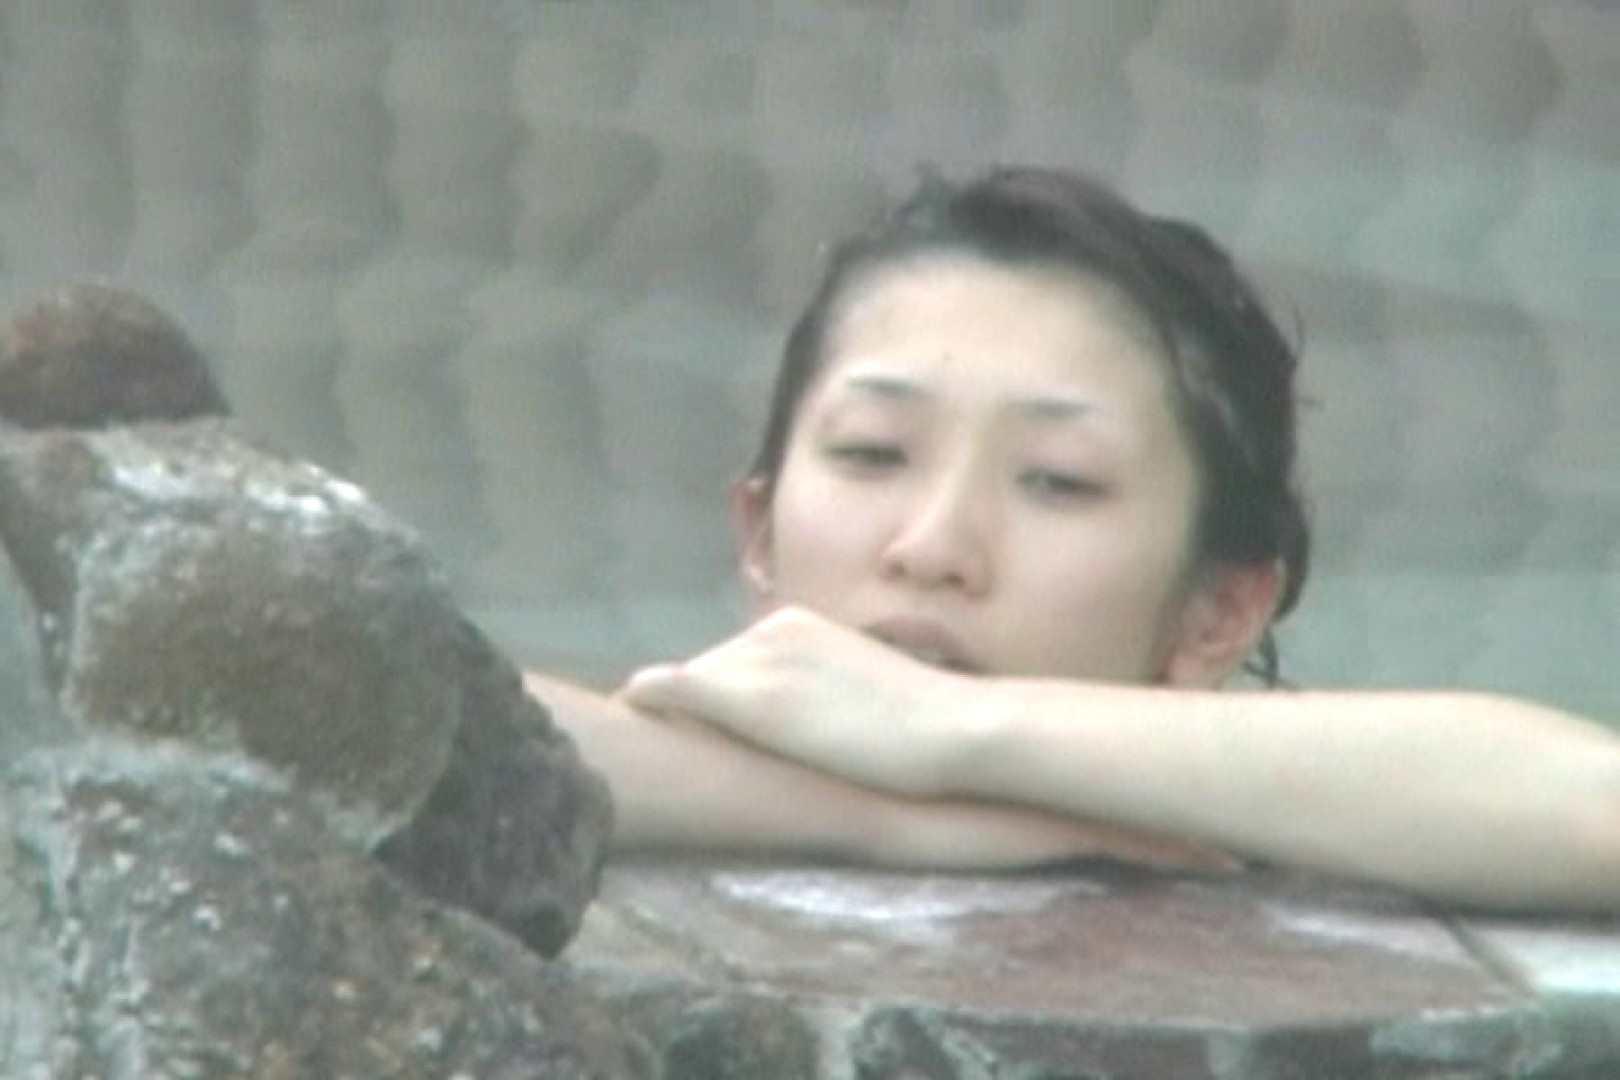 Aquaな露天風呂Vol.588 HなOL | 盗撮  66pic 19